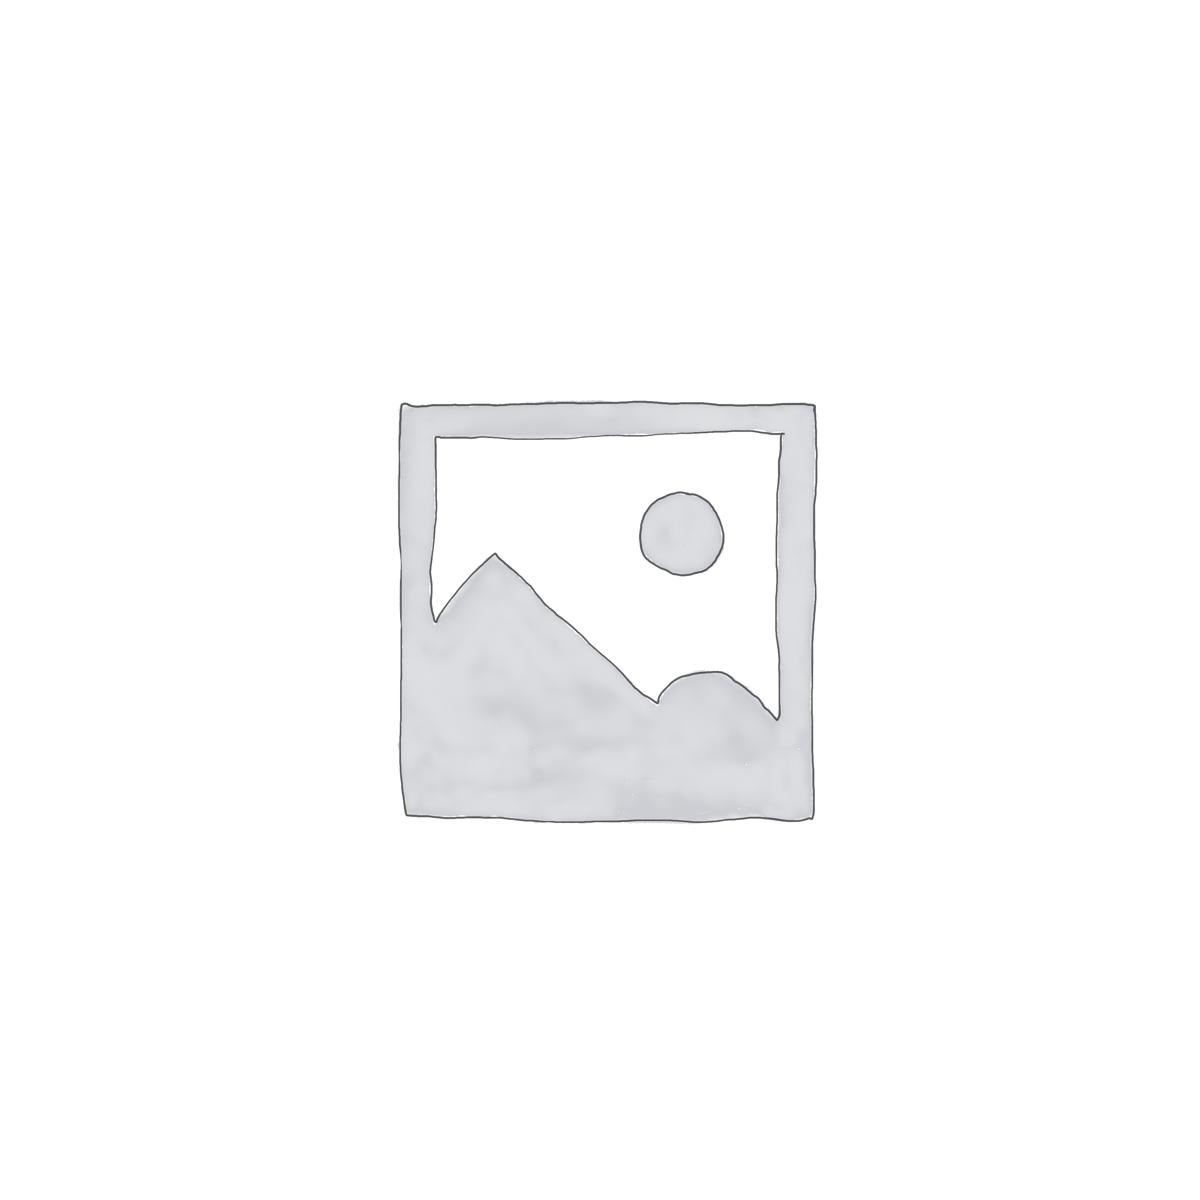 Monochrome Grunge Leaf with Splash Wallpaper Mural